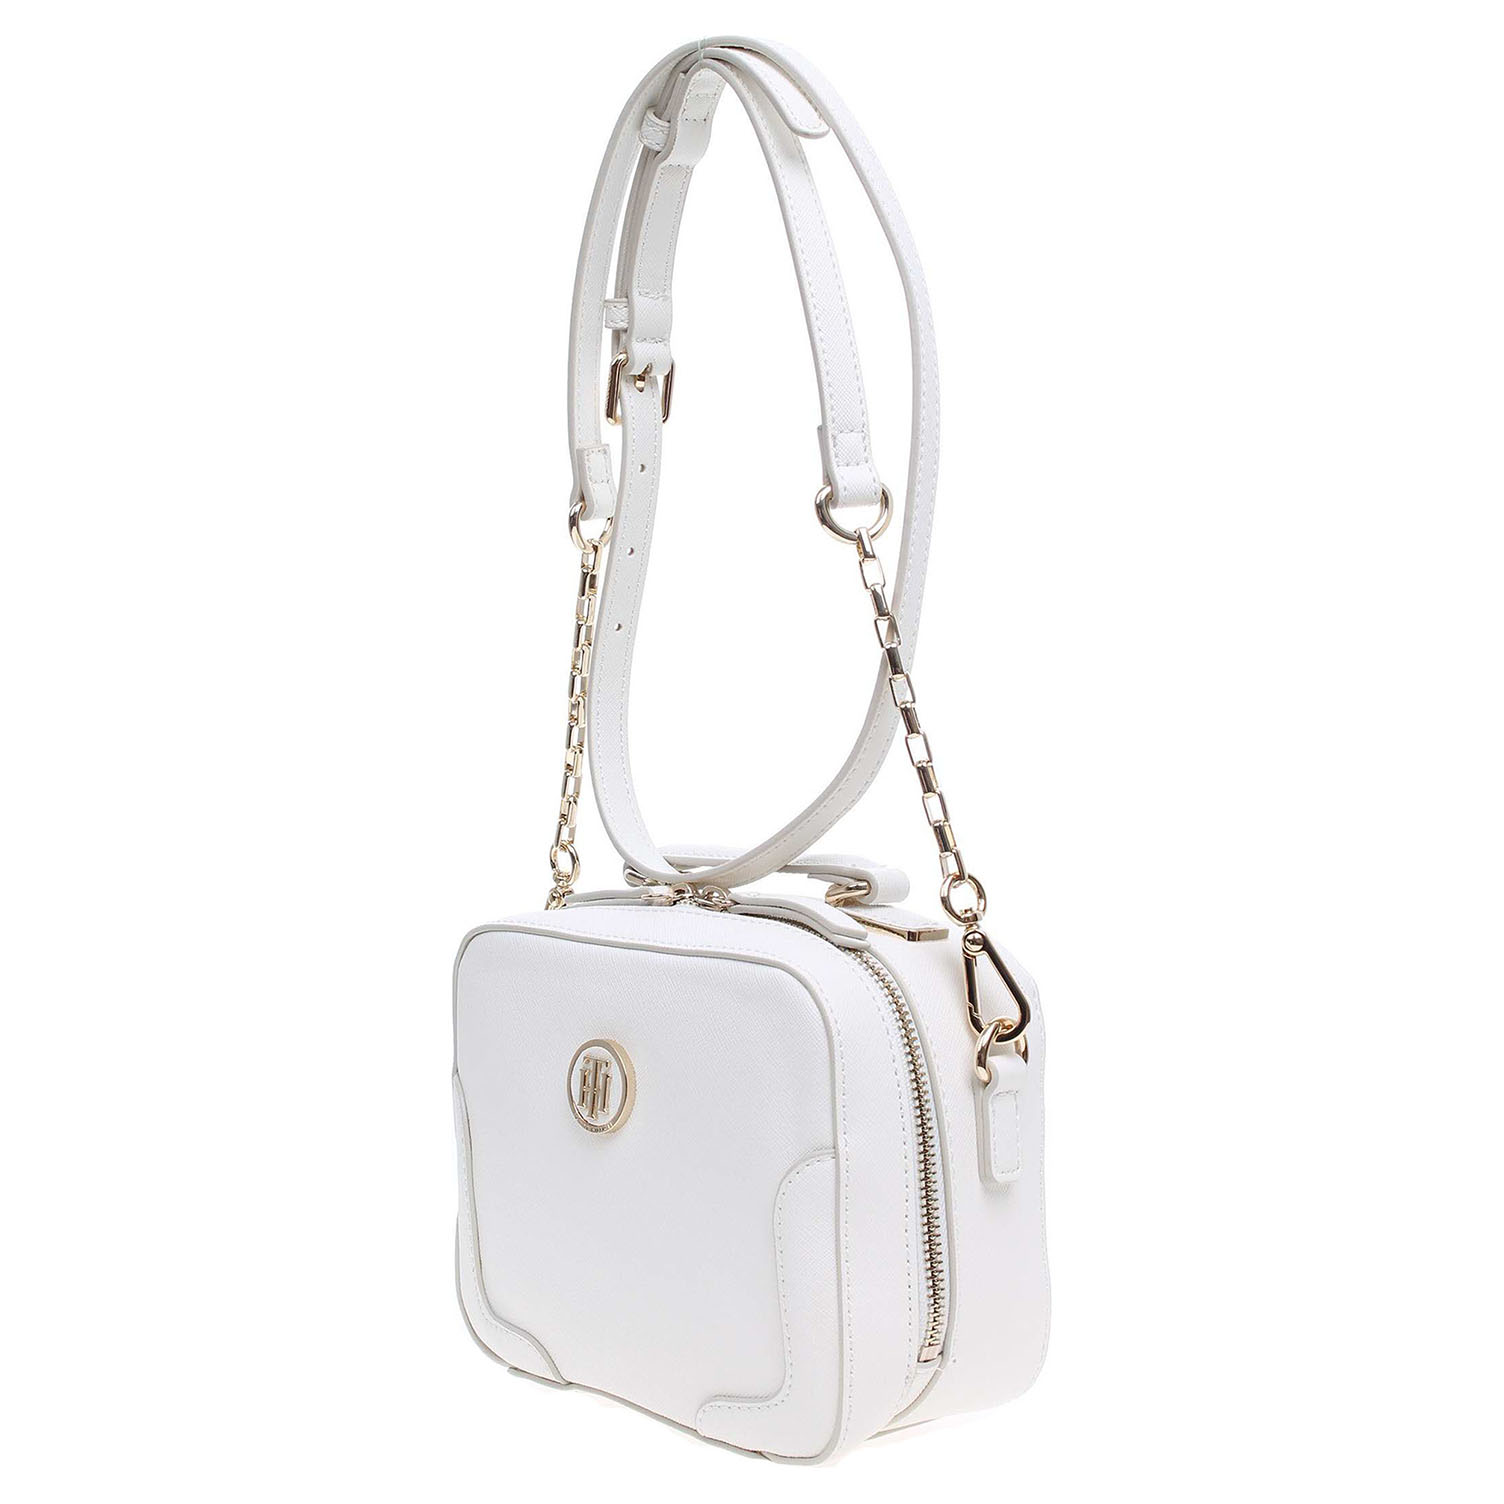 Ecco Tommy Hilfiger dámská kabelka AW0AW03675 bílá 11891143